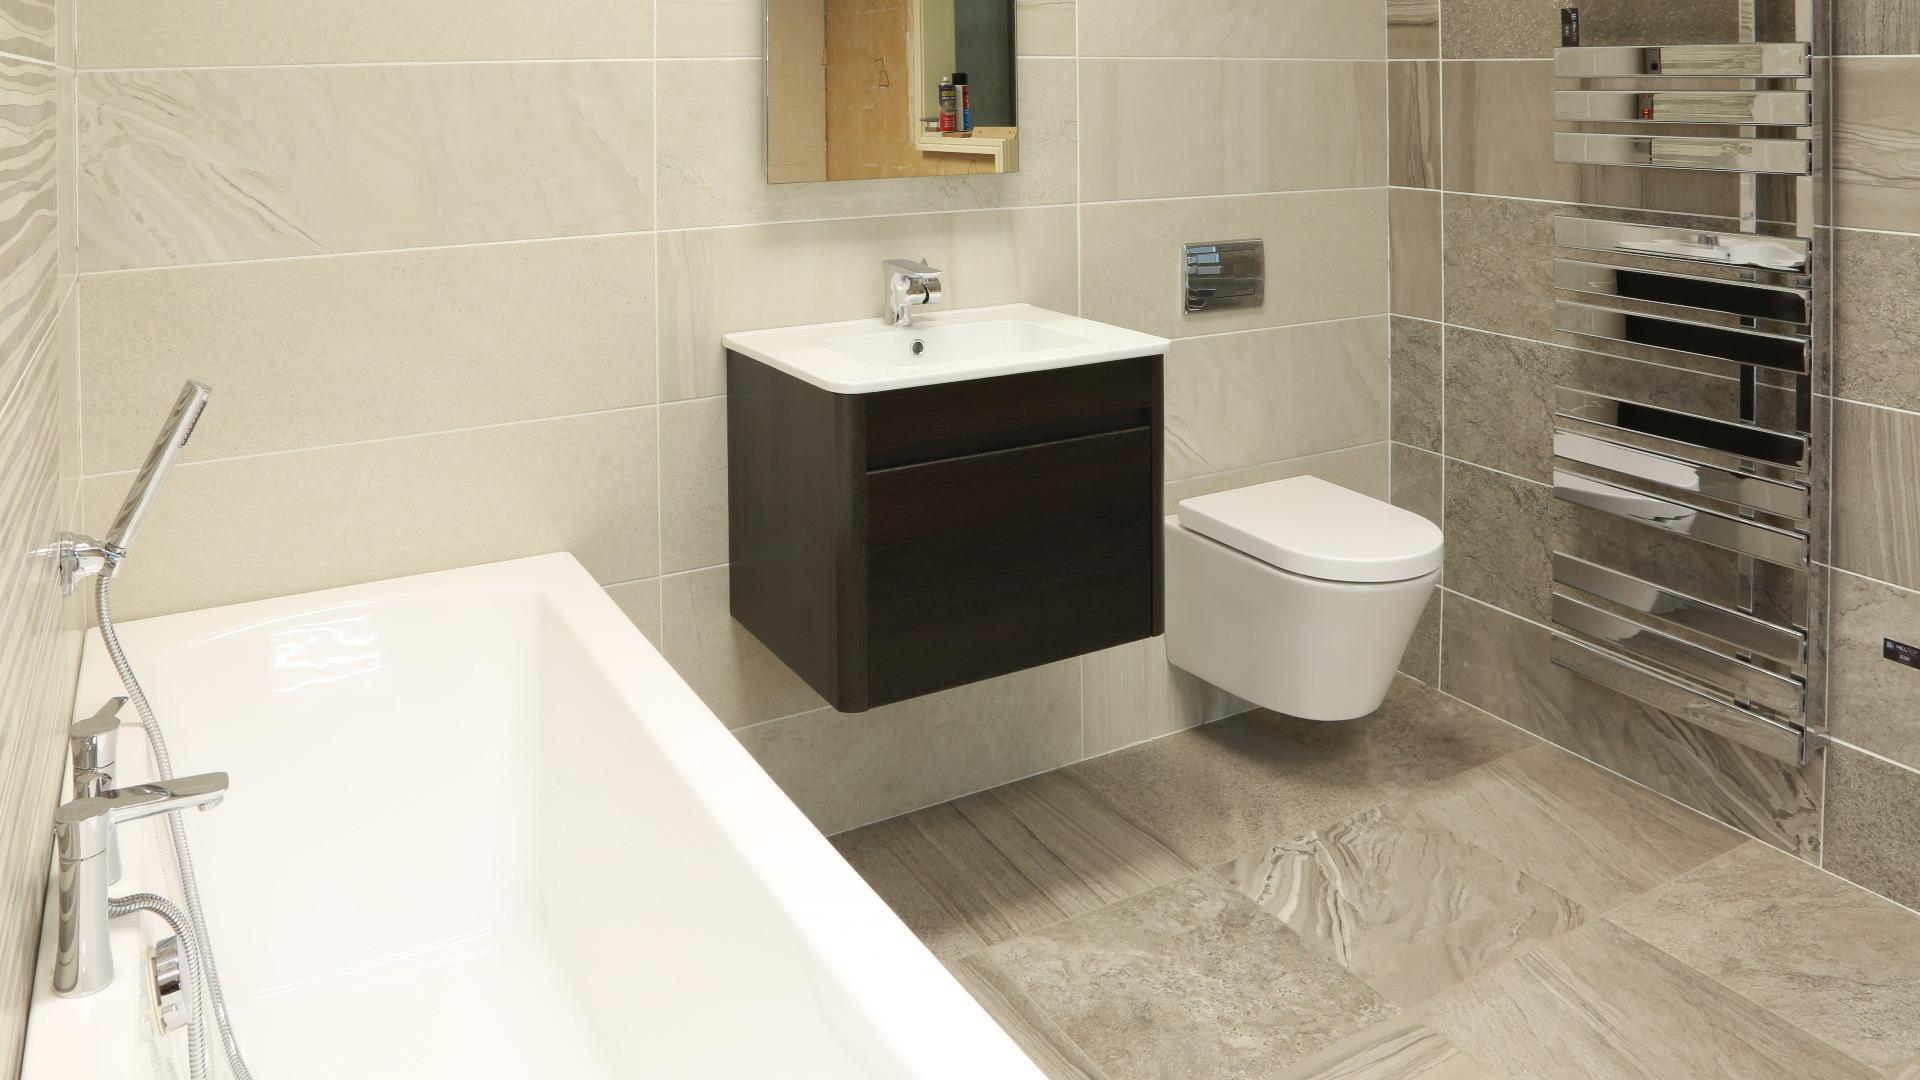 Elegant Karina39s House Project Bathroom Tile Selection